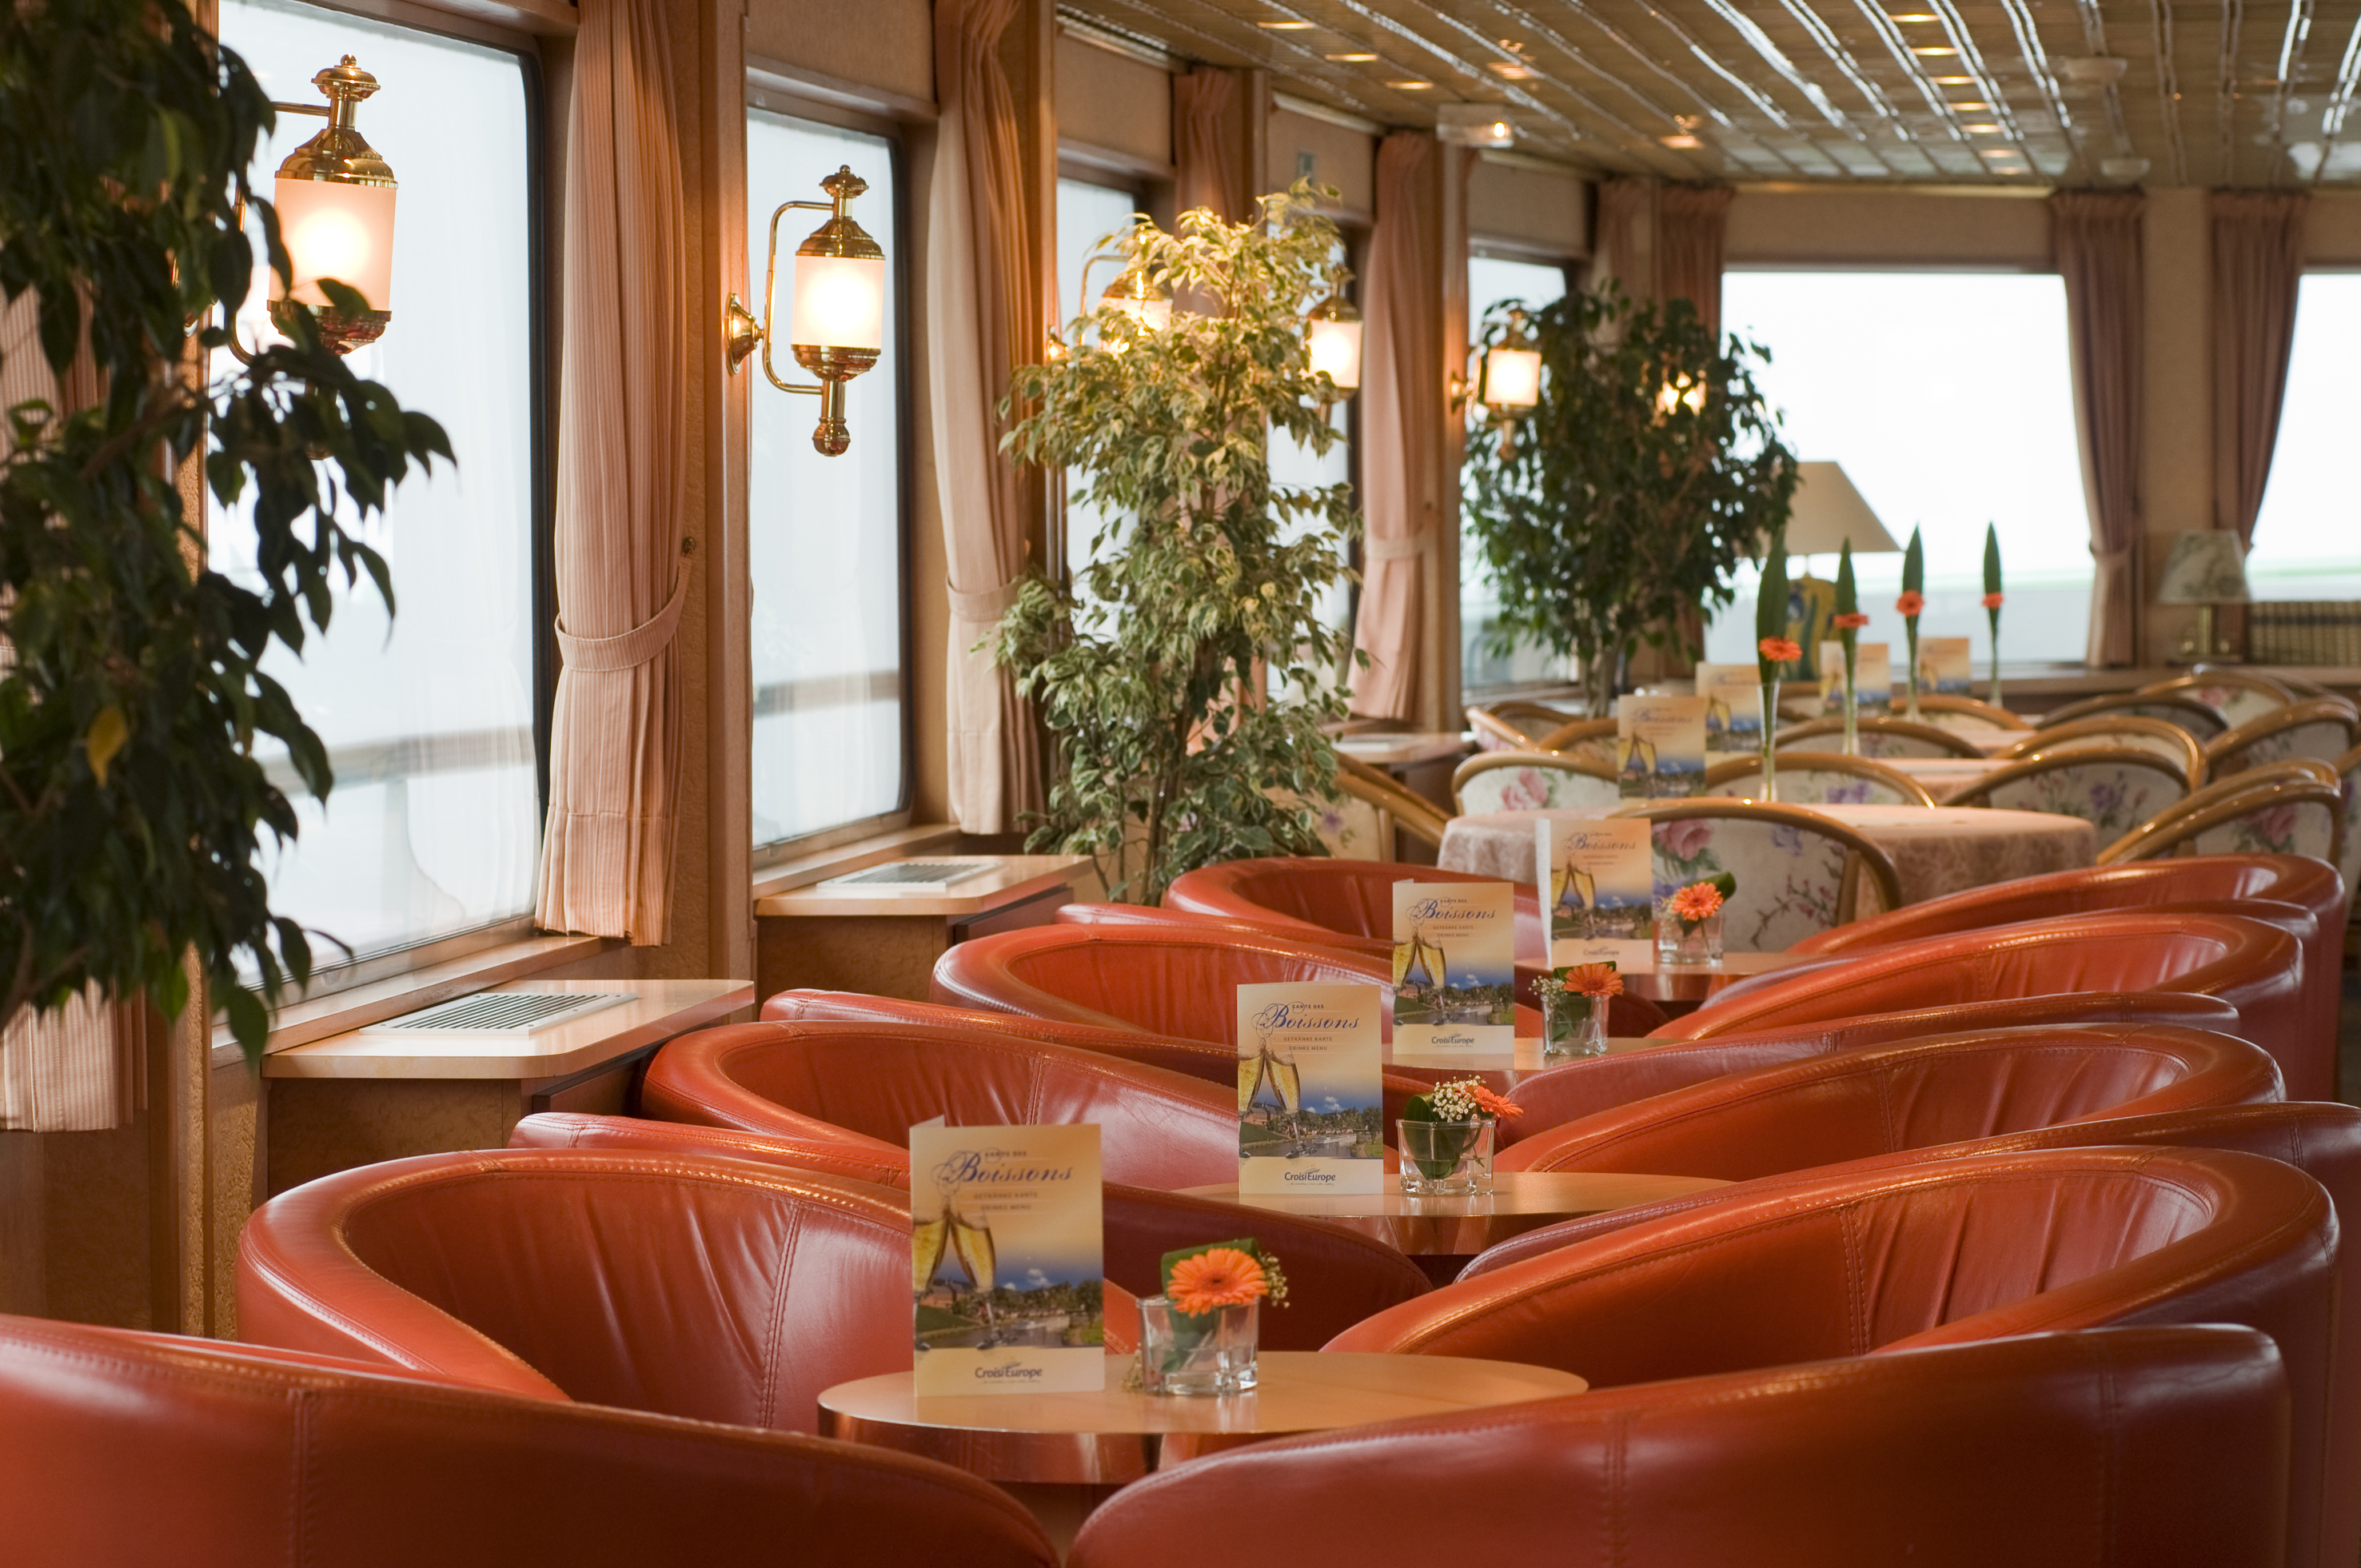 CroisiEurope MS Seine Princess Interior Lounge Bar 9.jpg